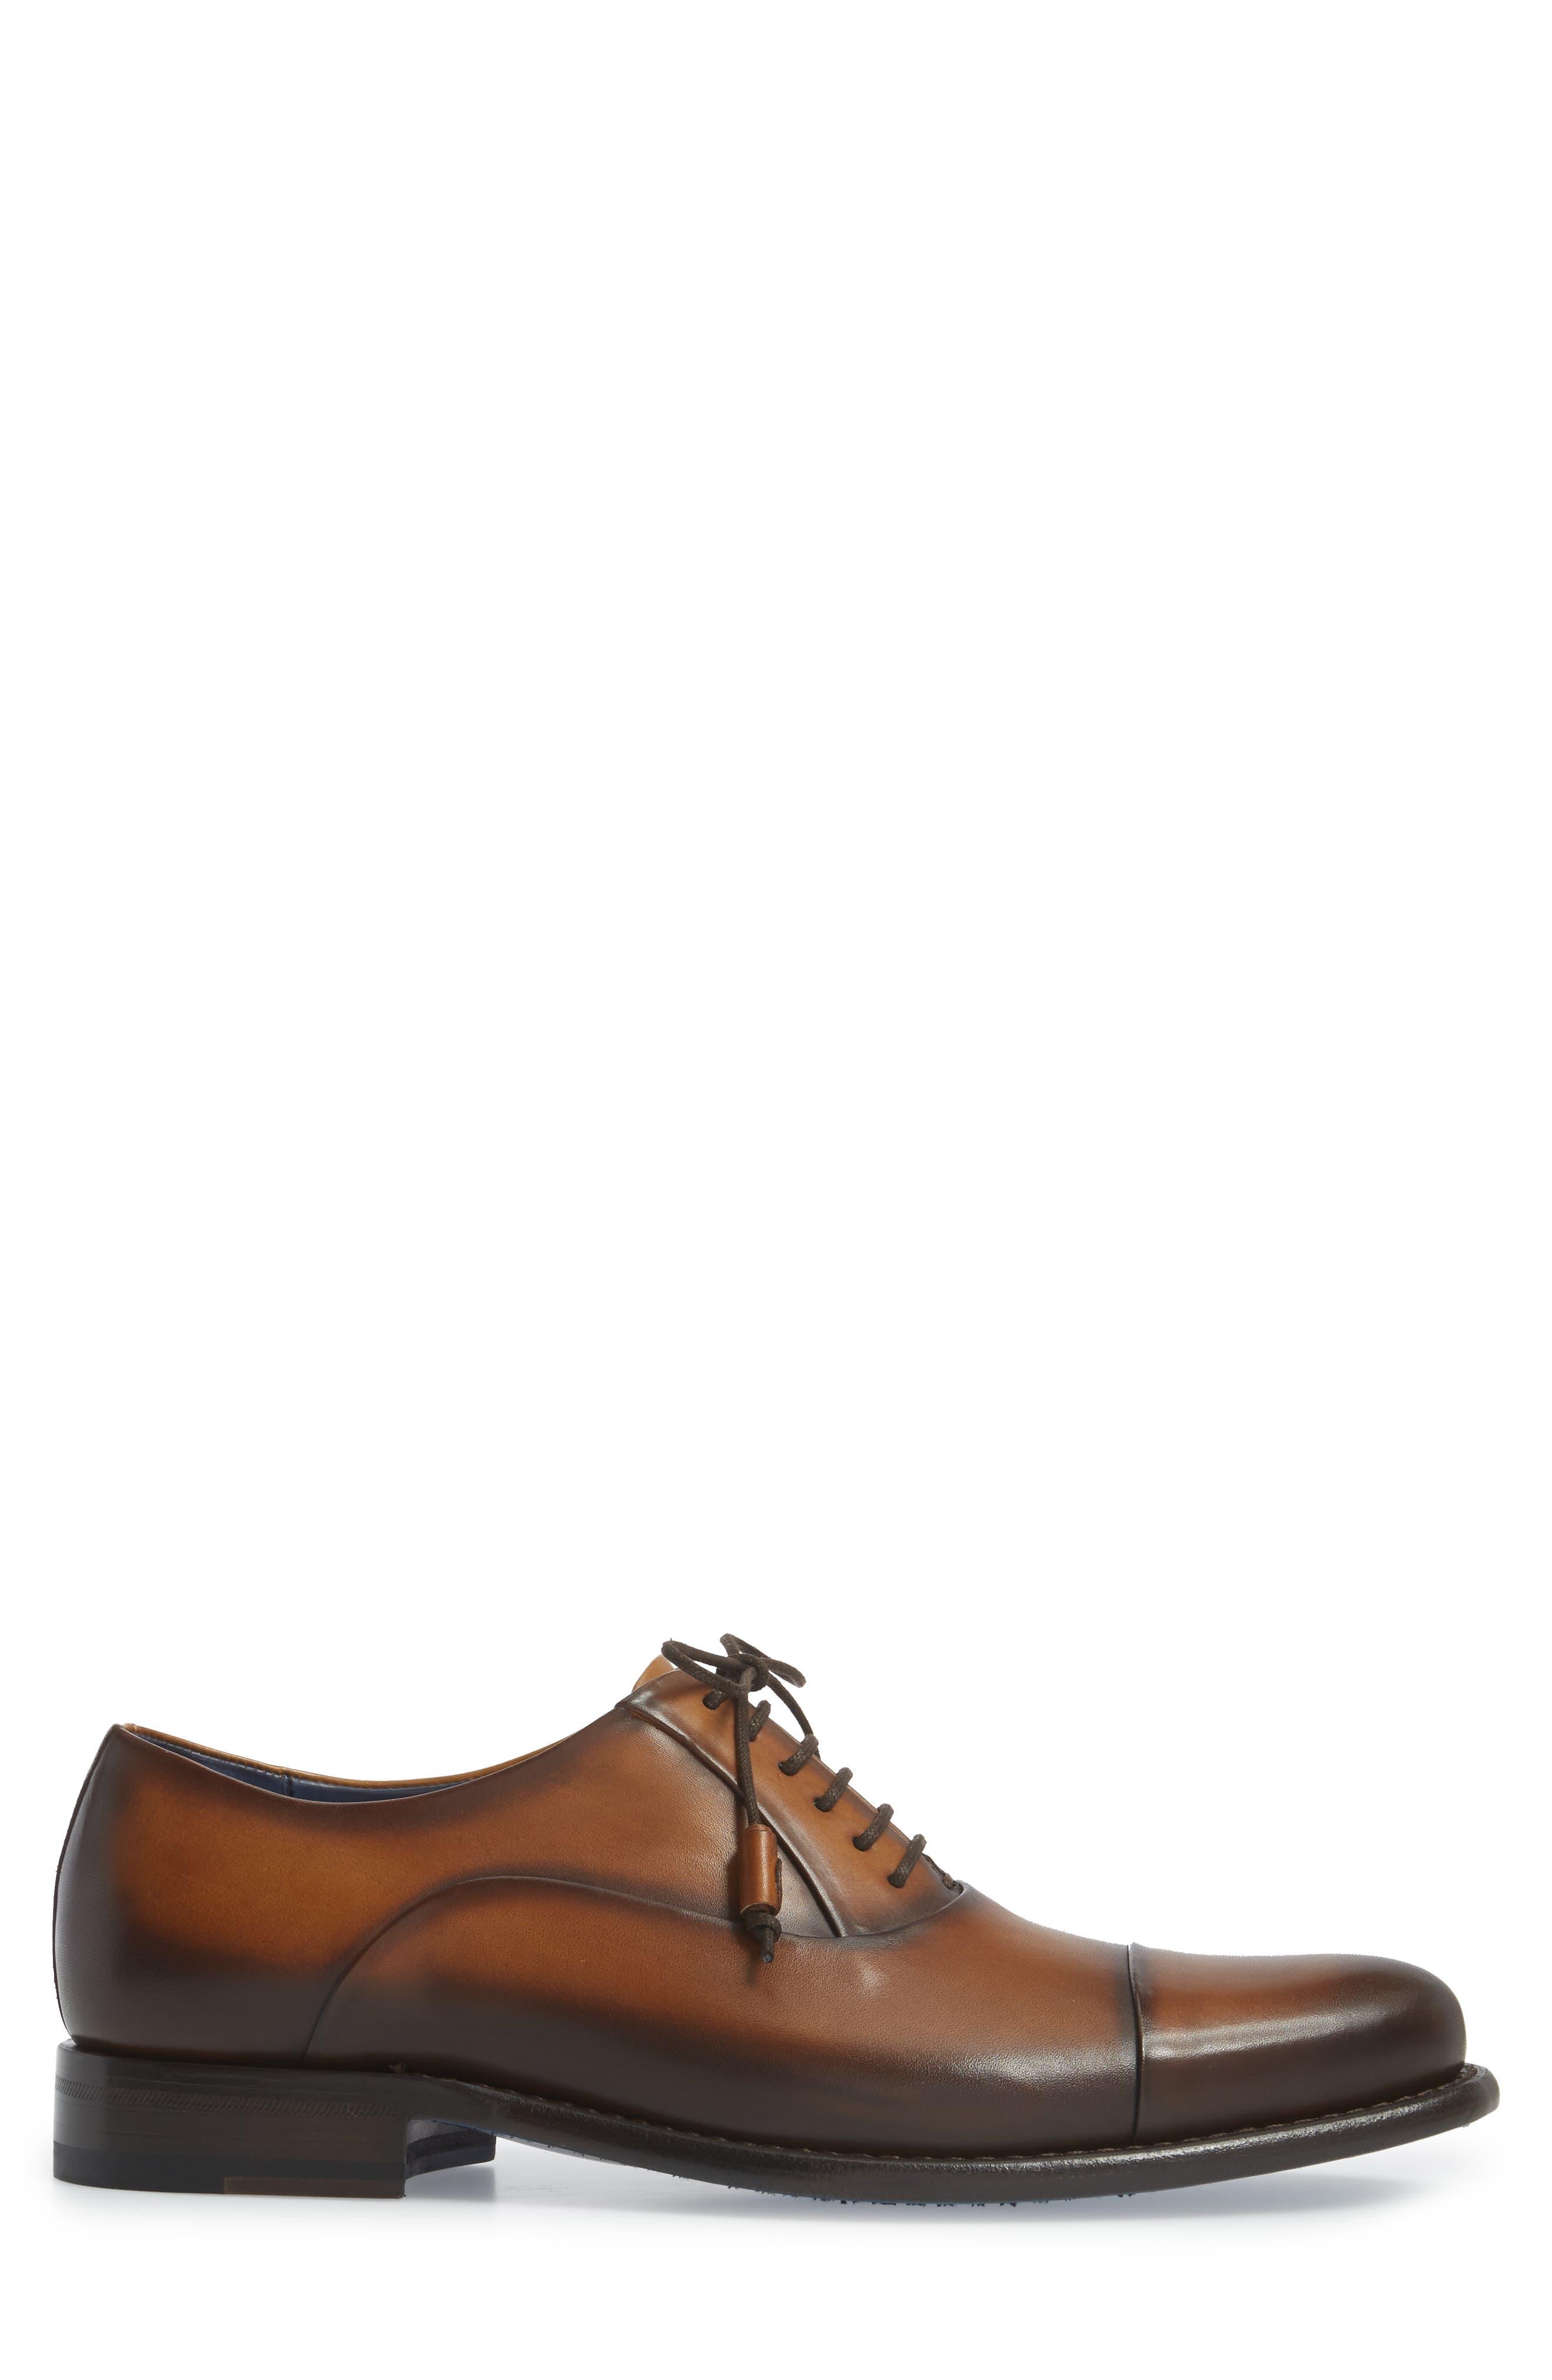 Helios Cap Toe Oxford,                             Alternate thumbnail 3, color,                             Honey Leather